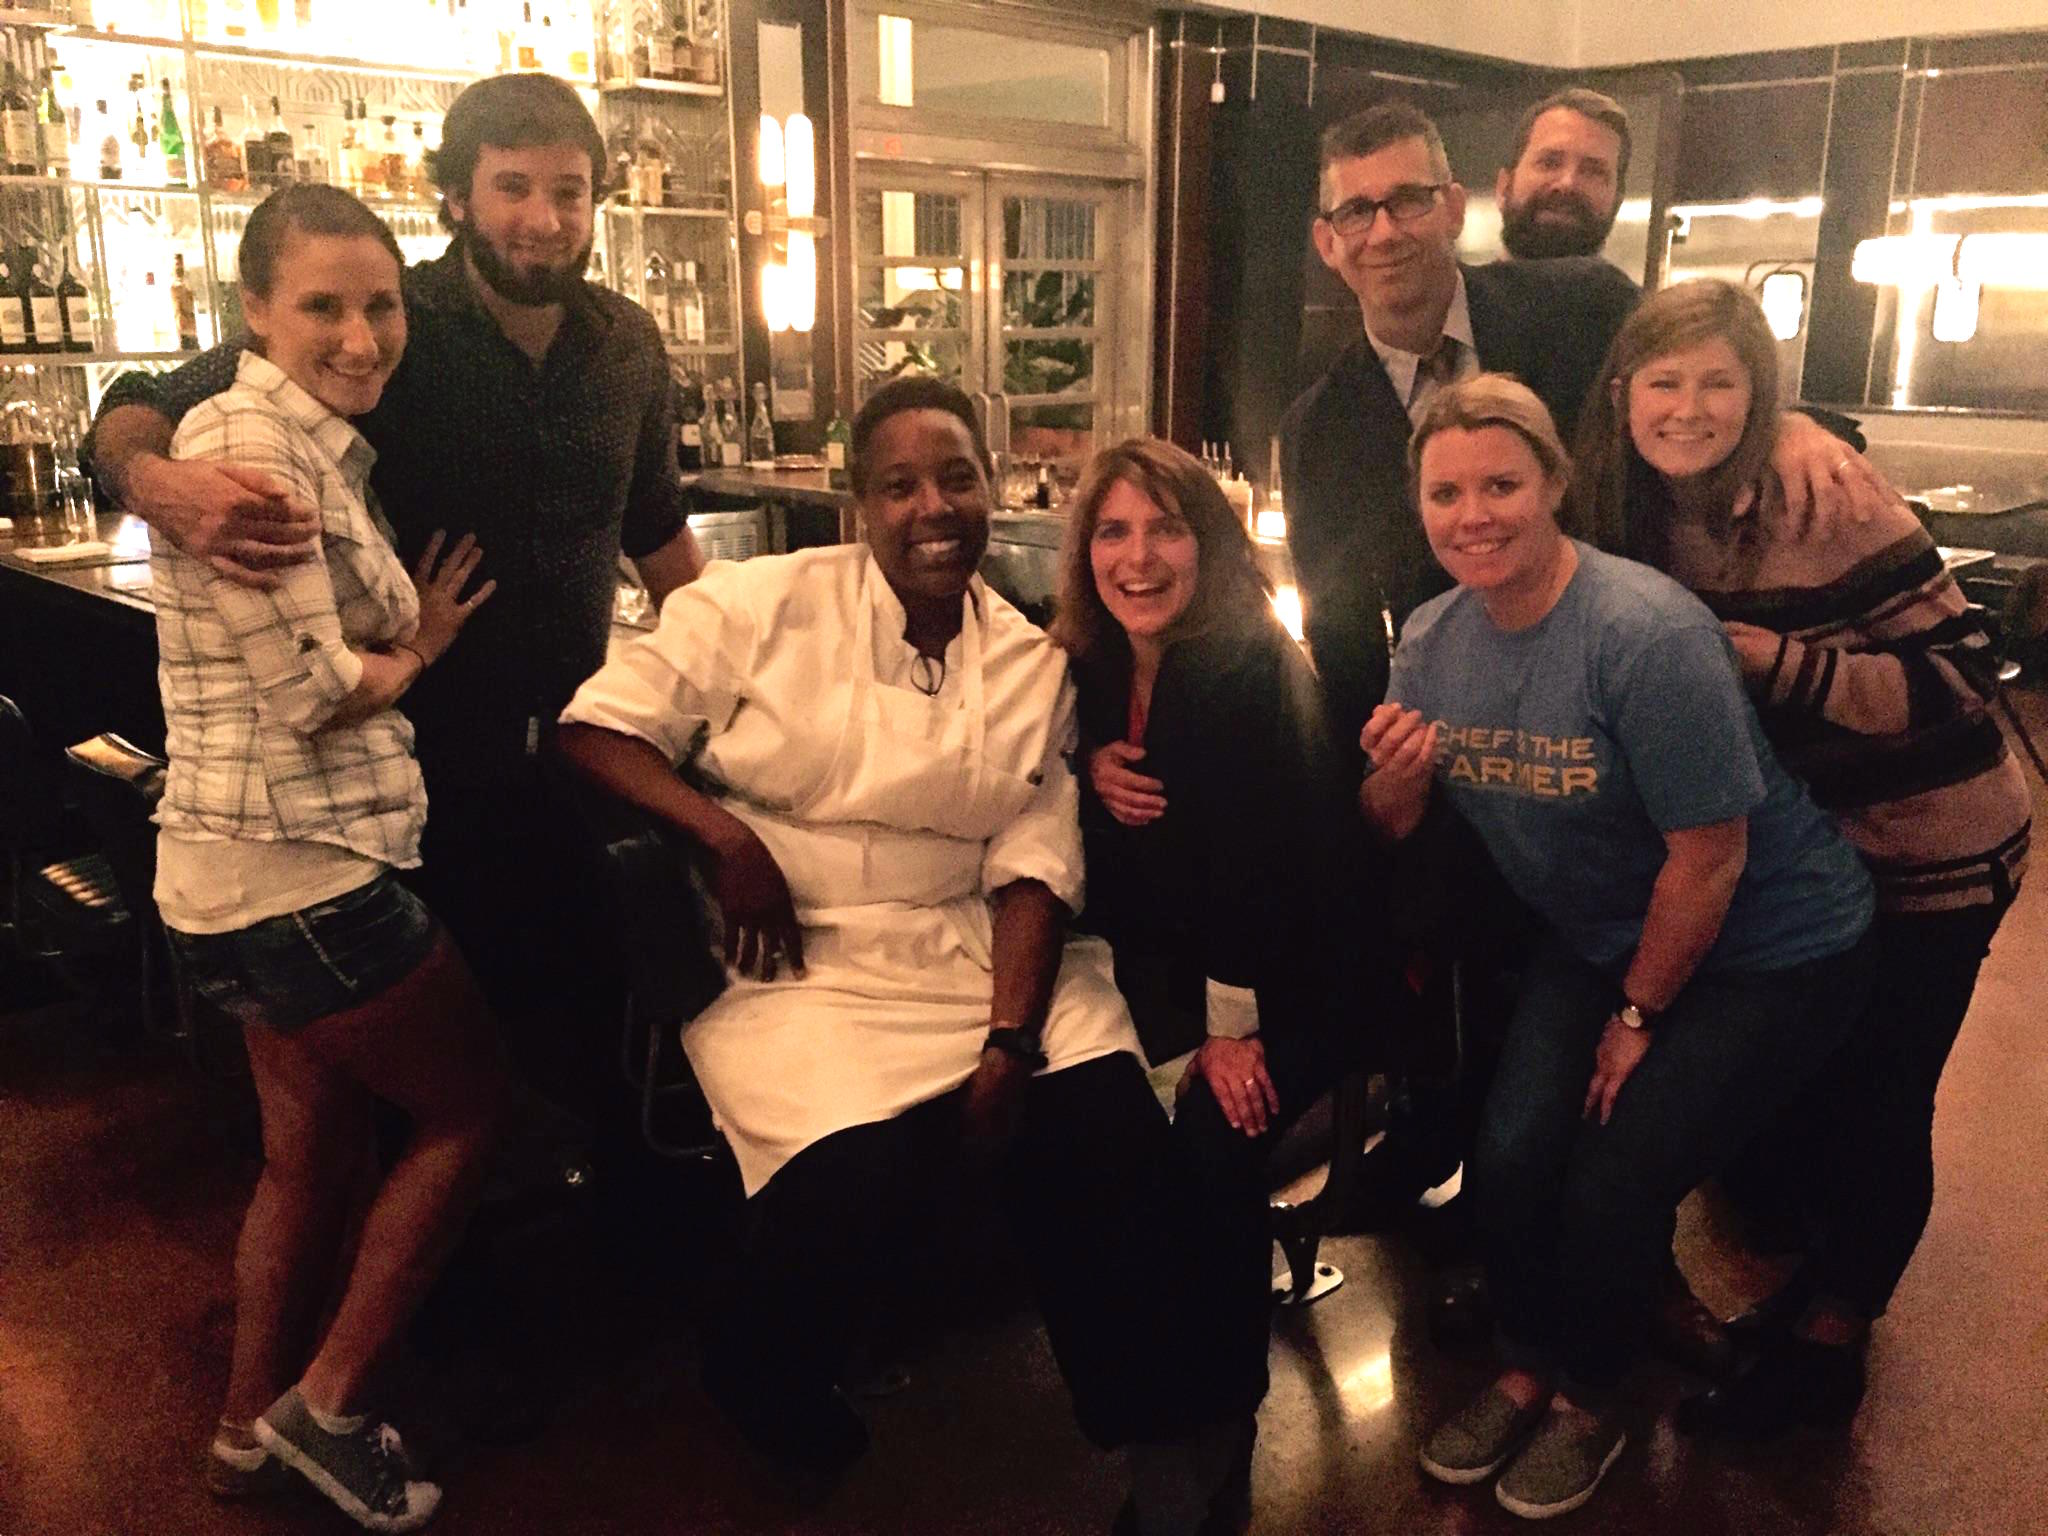 Team Georgia at The Grey in Savannah. Chef Mashama Bailey in the center.